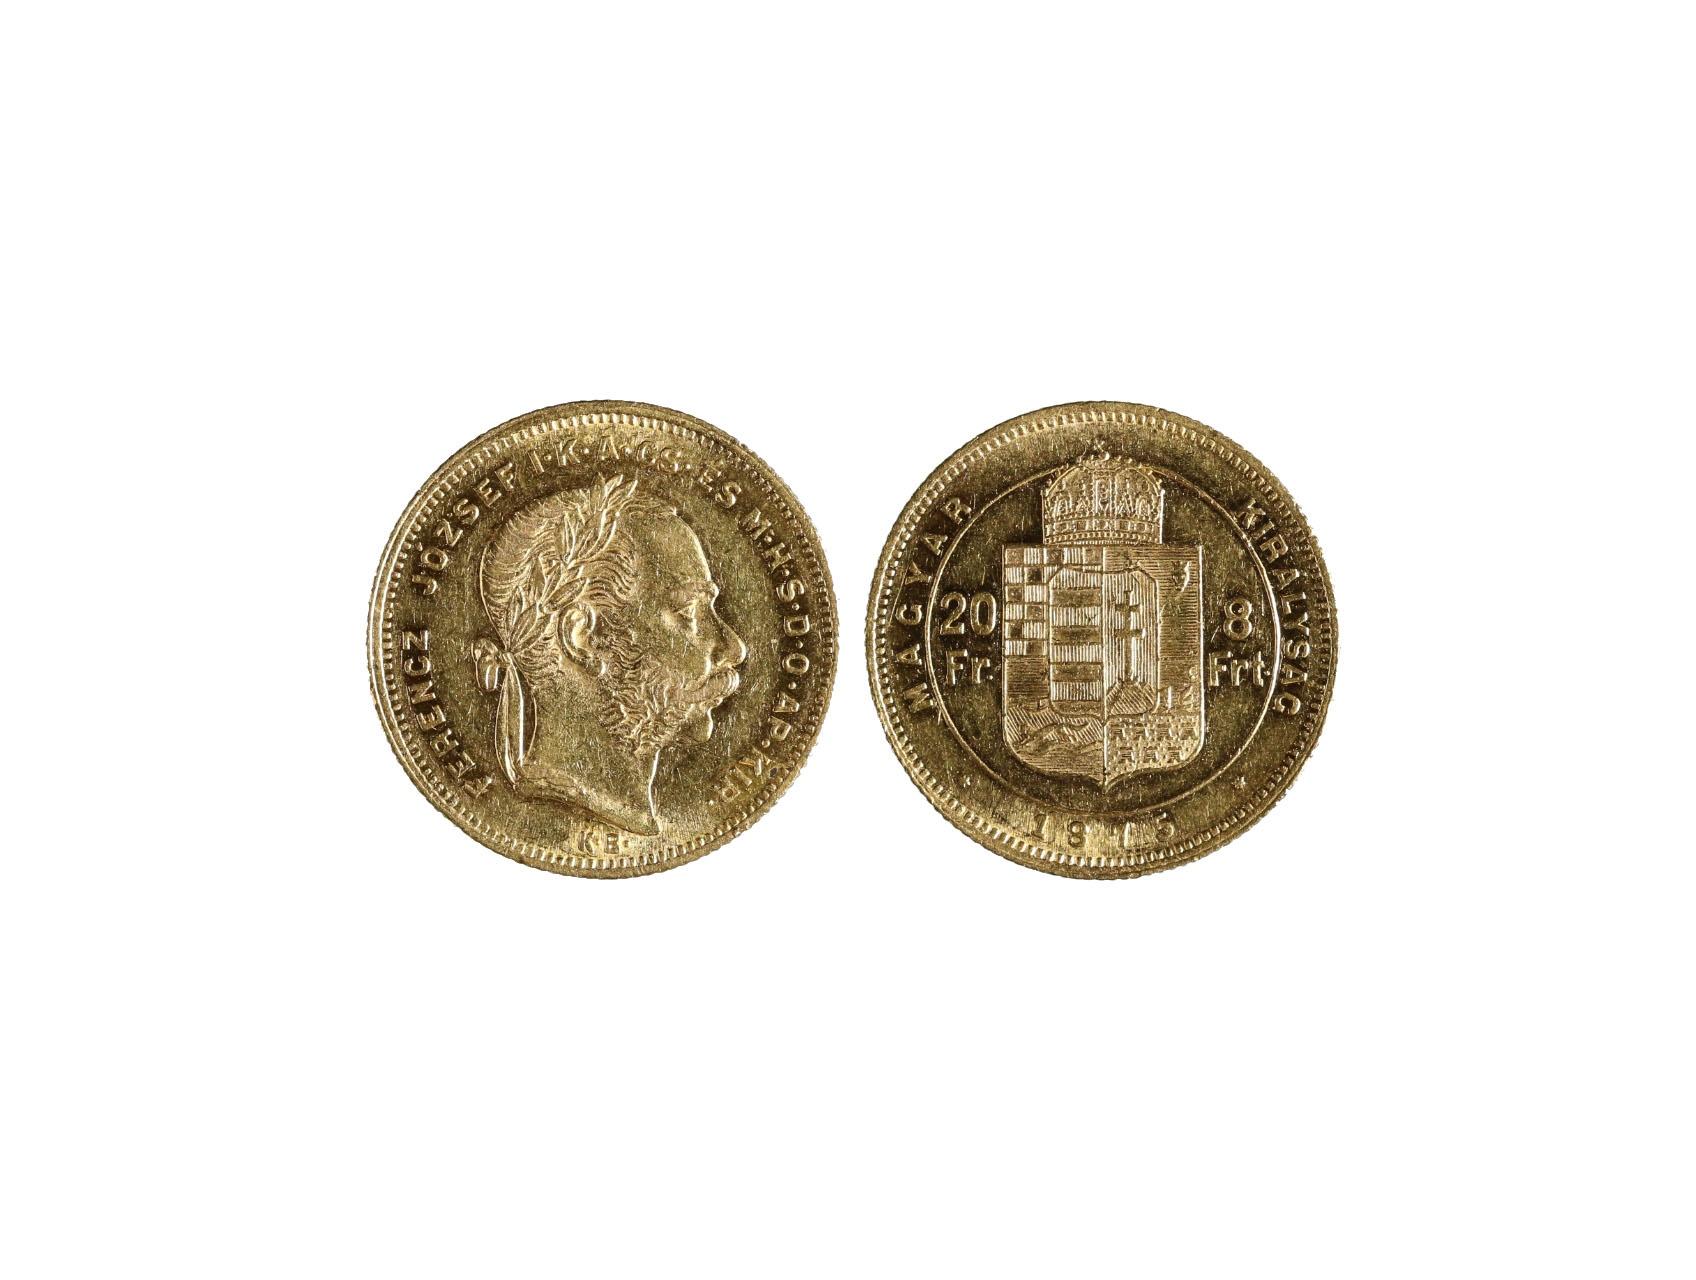 František Josef I. 1848-1916 - 8 Zlatník 1875 K.B., N127